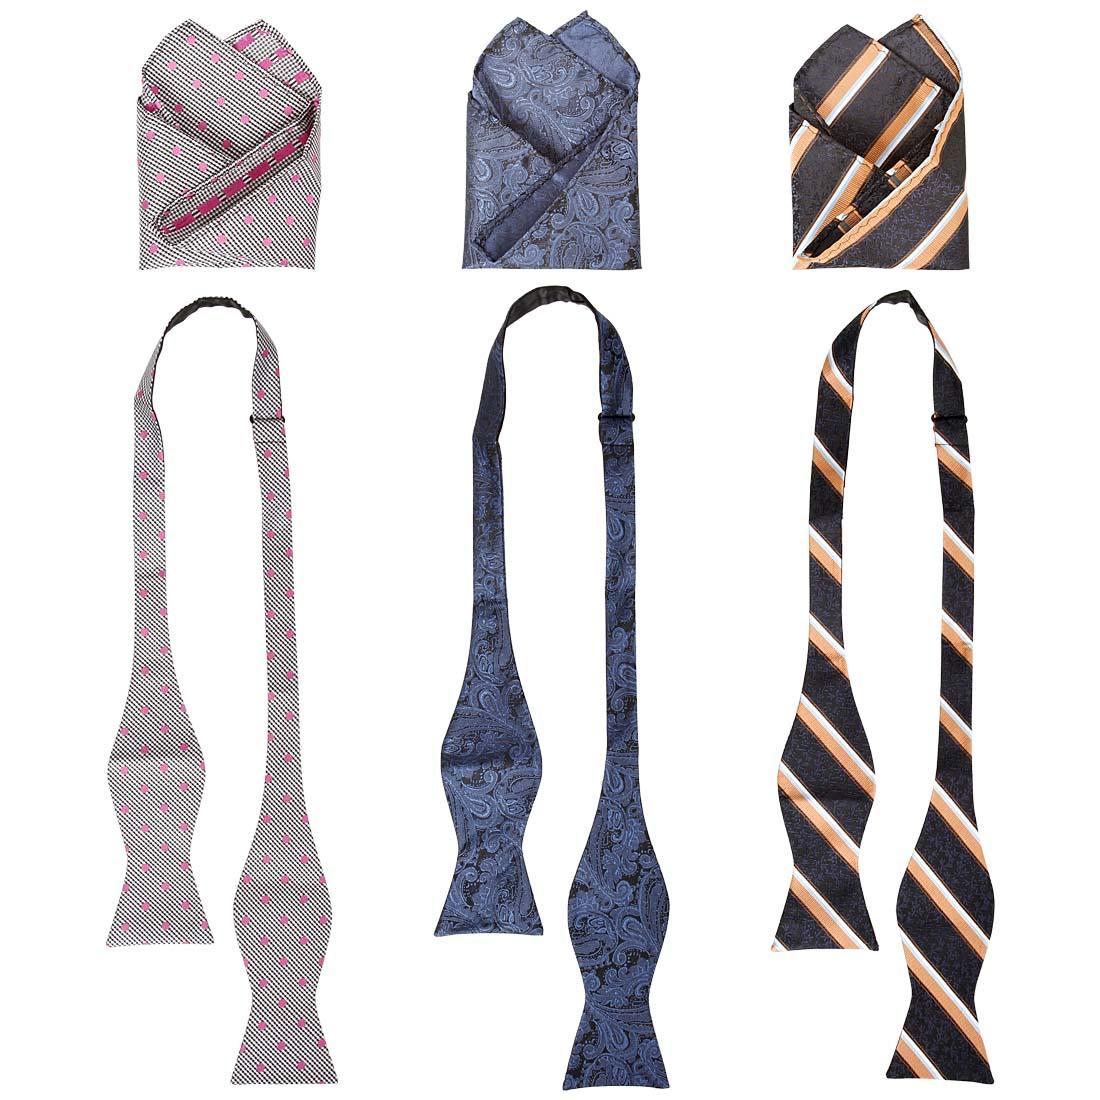 BMC Mens 6 pc Mixed Design Self Tie Bowtie Pocket Square Suit Accessories